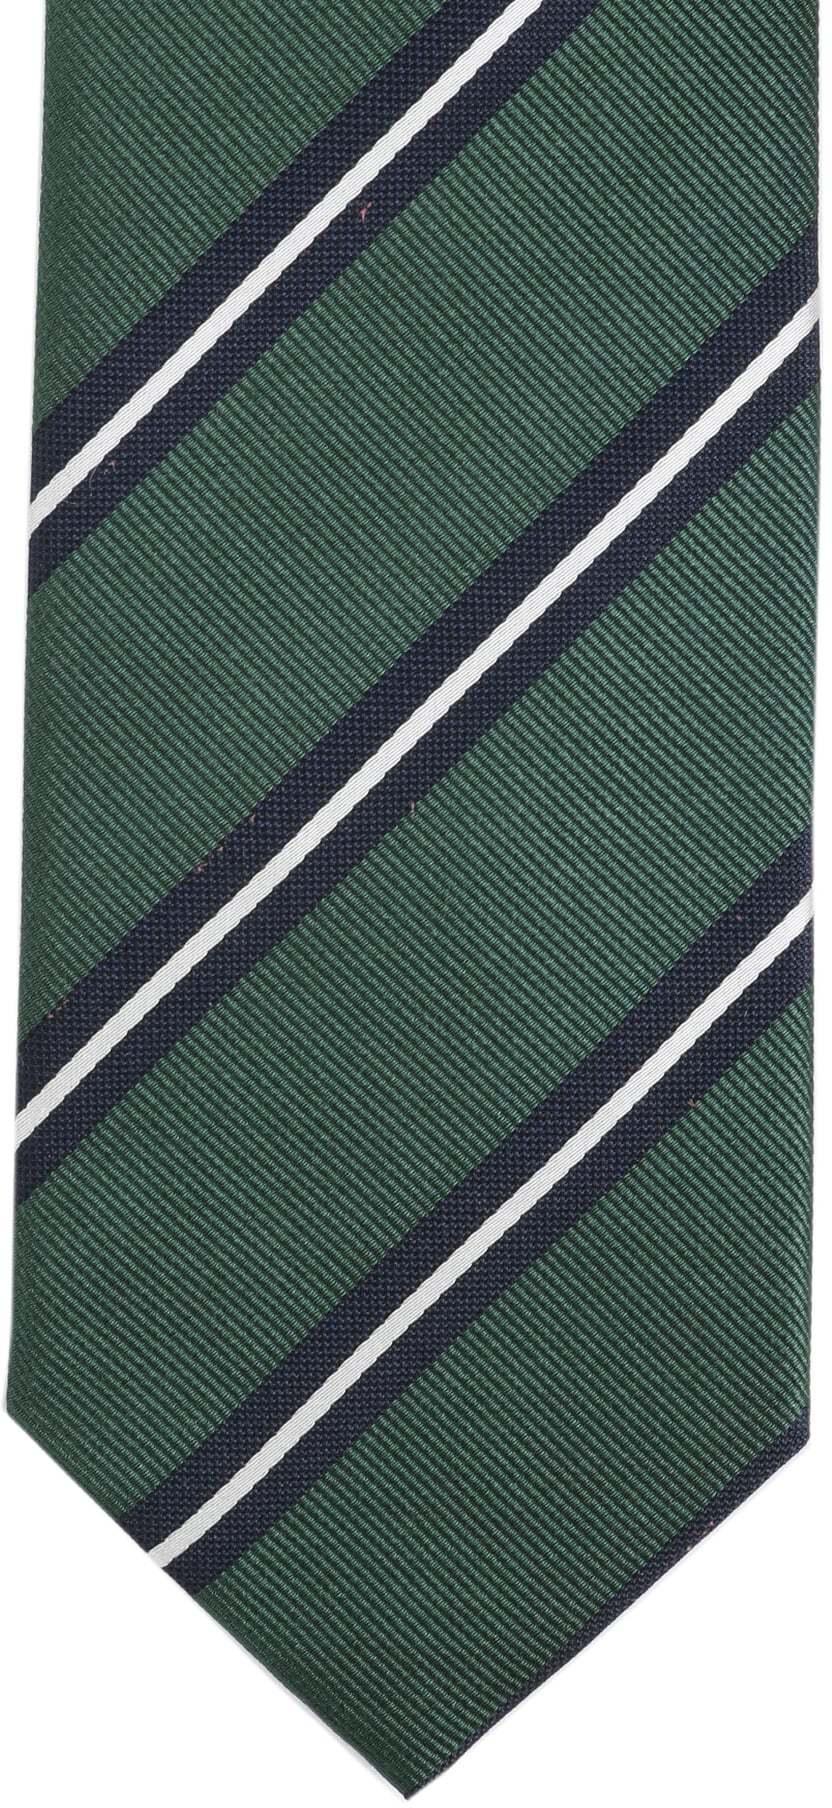 Krawatte Seide Grün Streifen foto 2